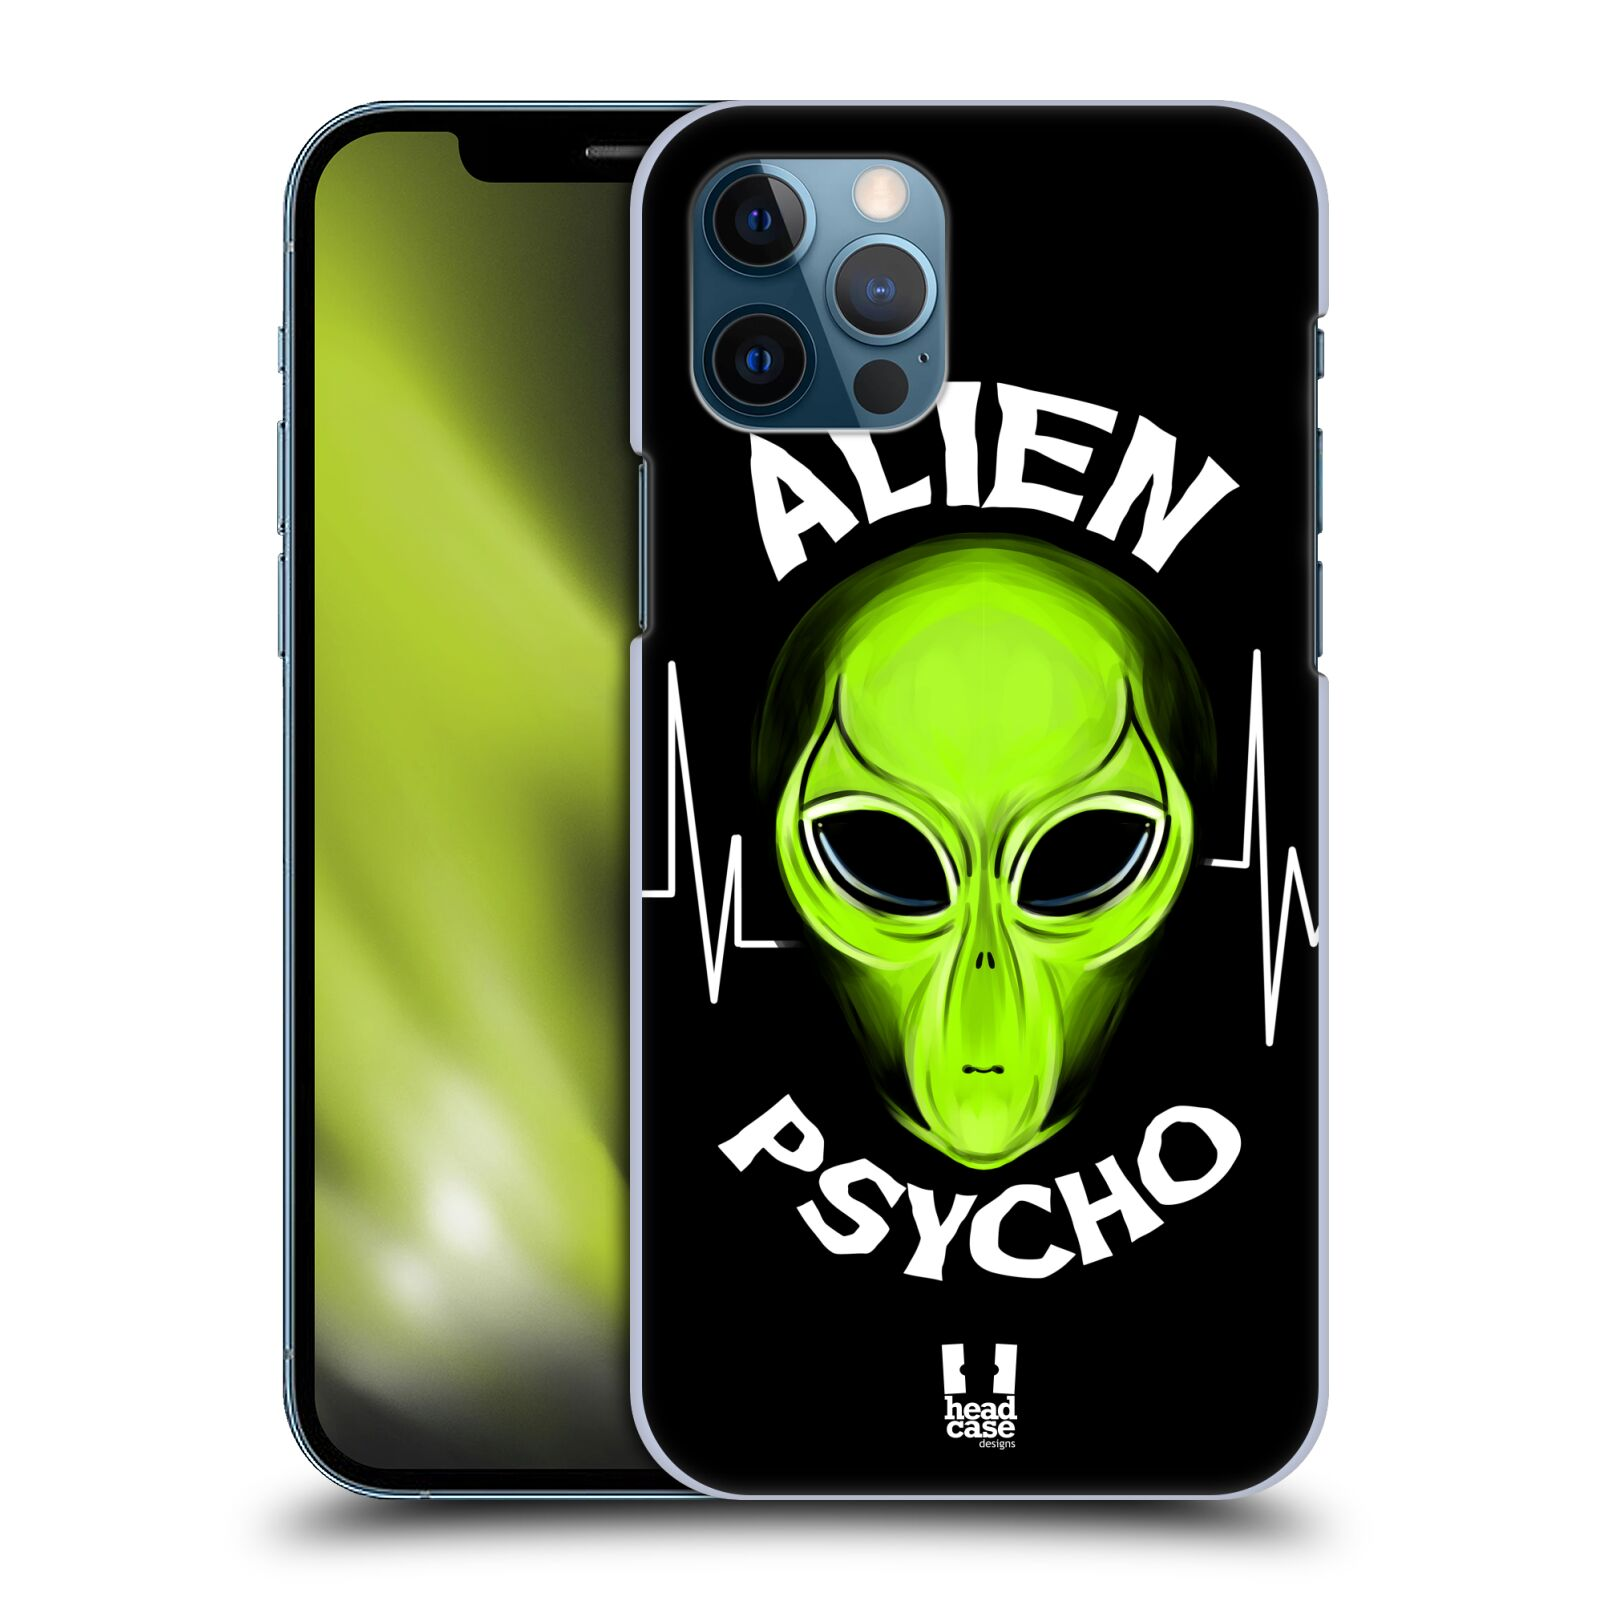 Plastové pouzdro na mobil Apple iPhone 12 / 12 Pro - Head Case - ALIENS PSYCHO